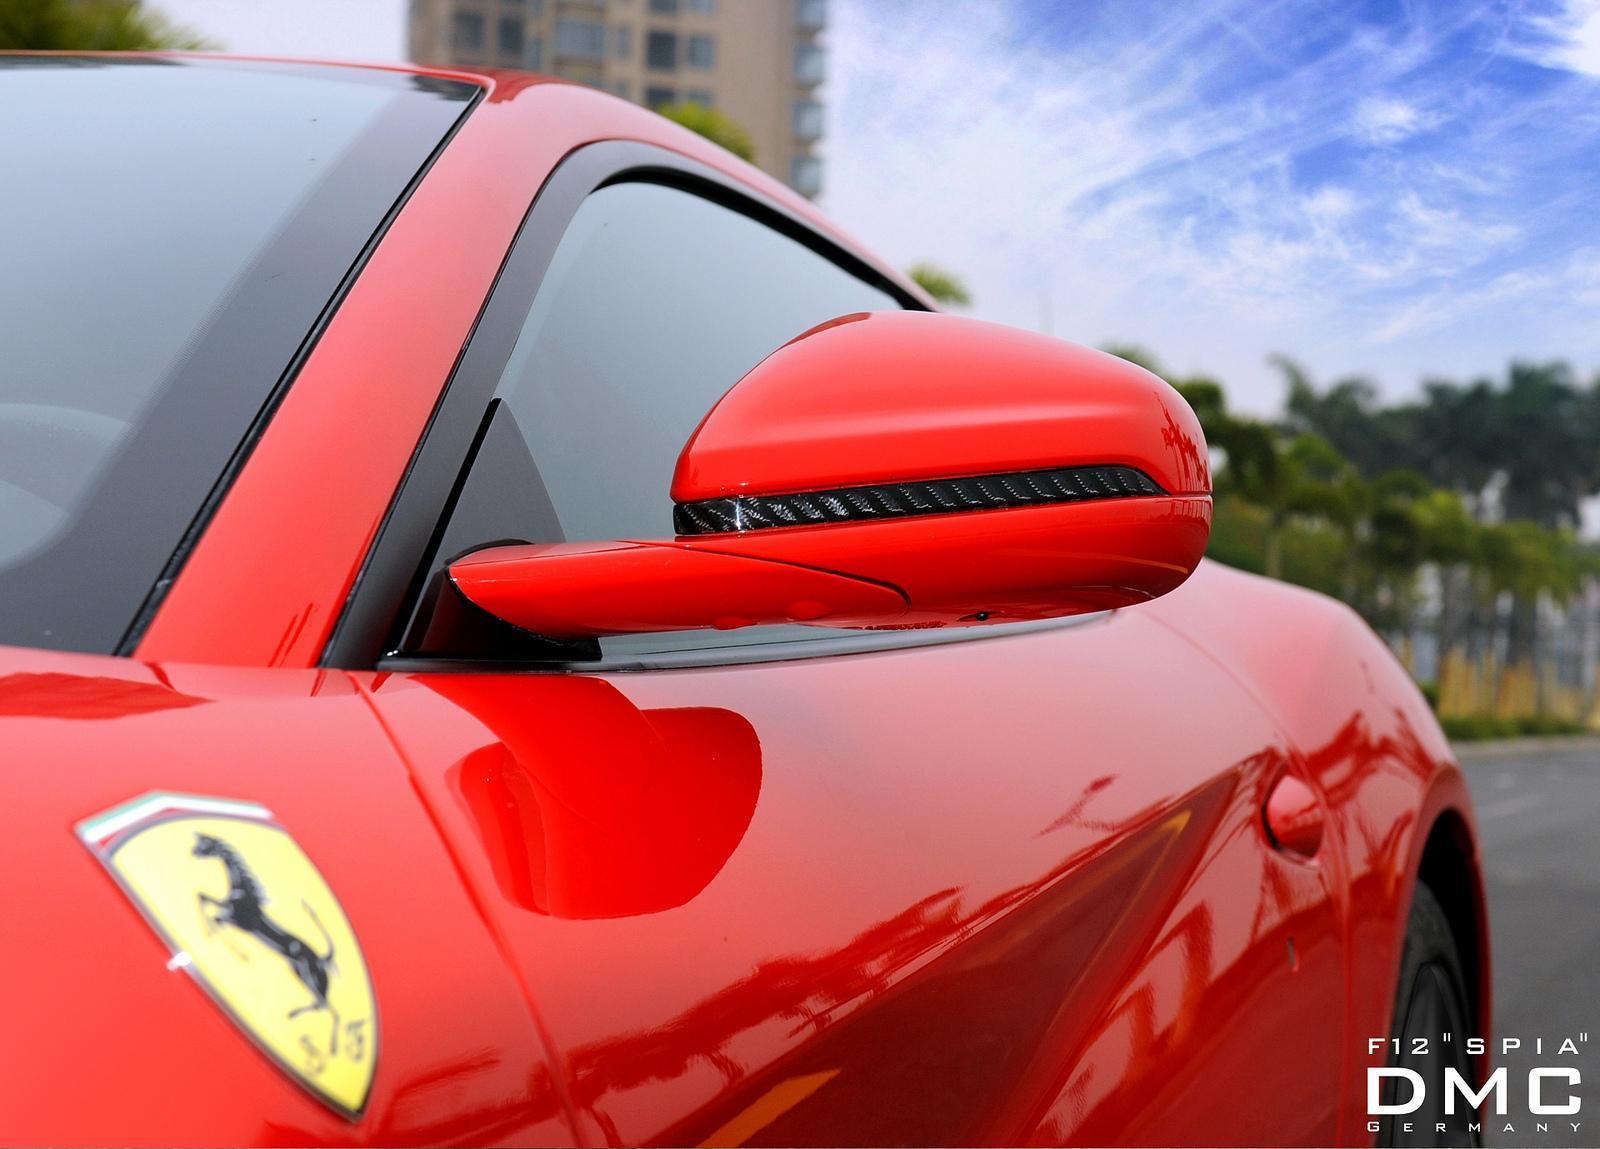 Foto de DMC Ferrari F12 Berlinetta Spia (8/10)